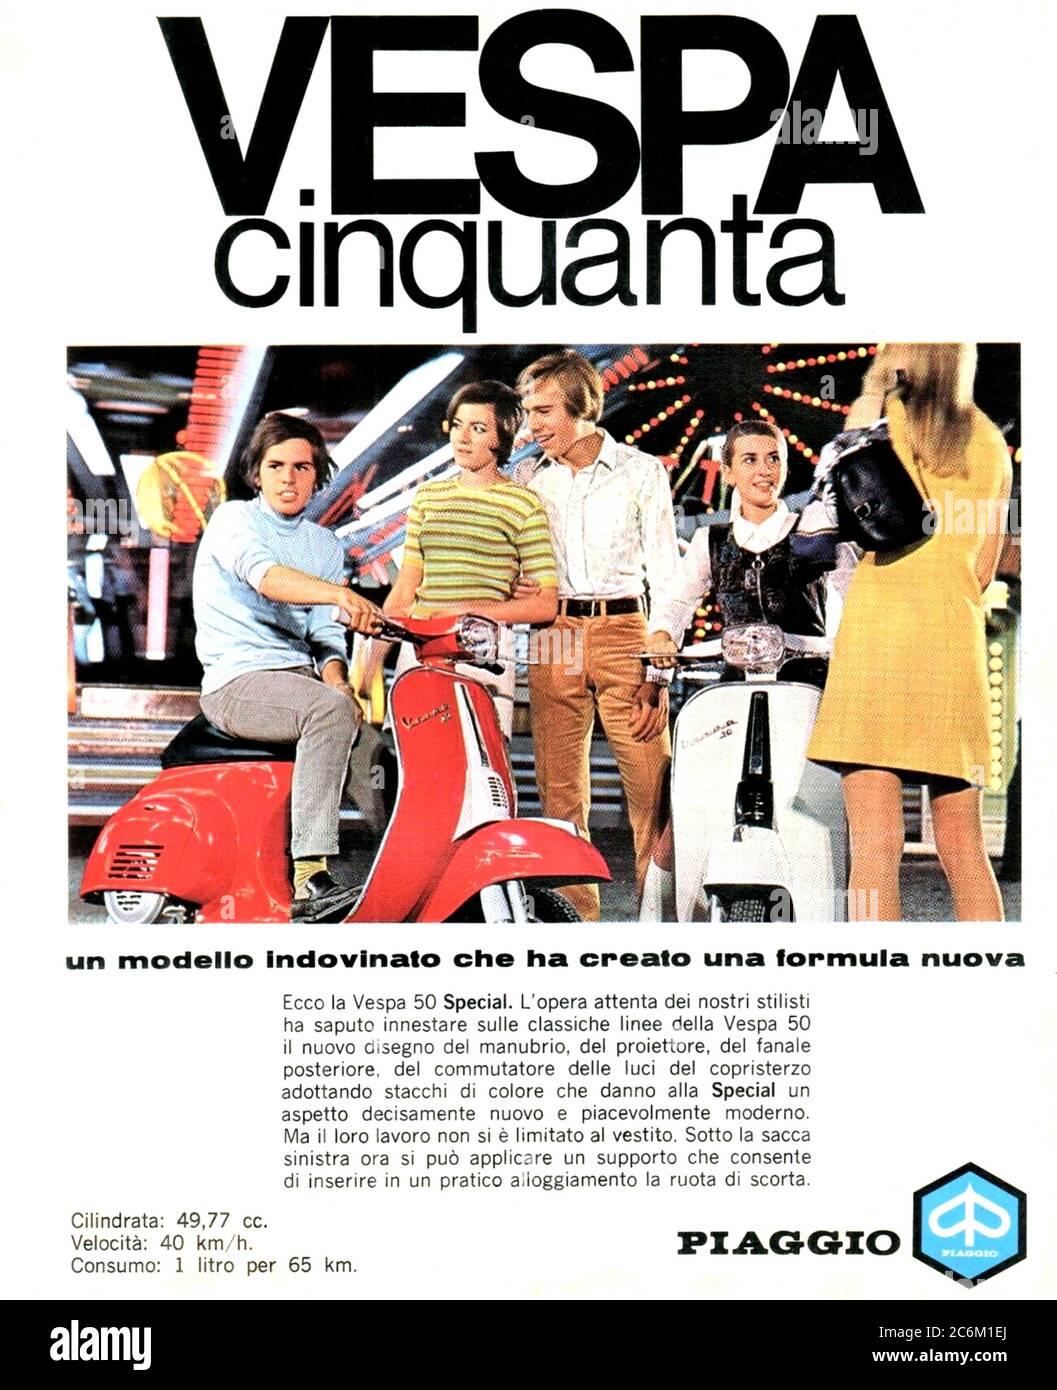 1970 , ITALY : The celebrated italian scooter VESPA 50 SPECIAL  by PIAGGIO industry , advertising . - SCOOTERS - motorino - moto -  INDUSTRIA - INDUSTRIALE - HISTORY -  foto storica - INDUSTRIALE - INDUSTRY - INDUSTRIA - ADVERTISING - pubblicità - moto - motociclismo - motorcycle - motoscooter - ANNI SETTANTA - '70 - 70's --- Archivio GBB Stock Photo